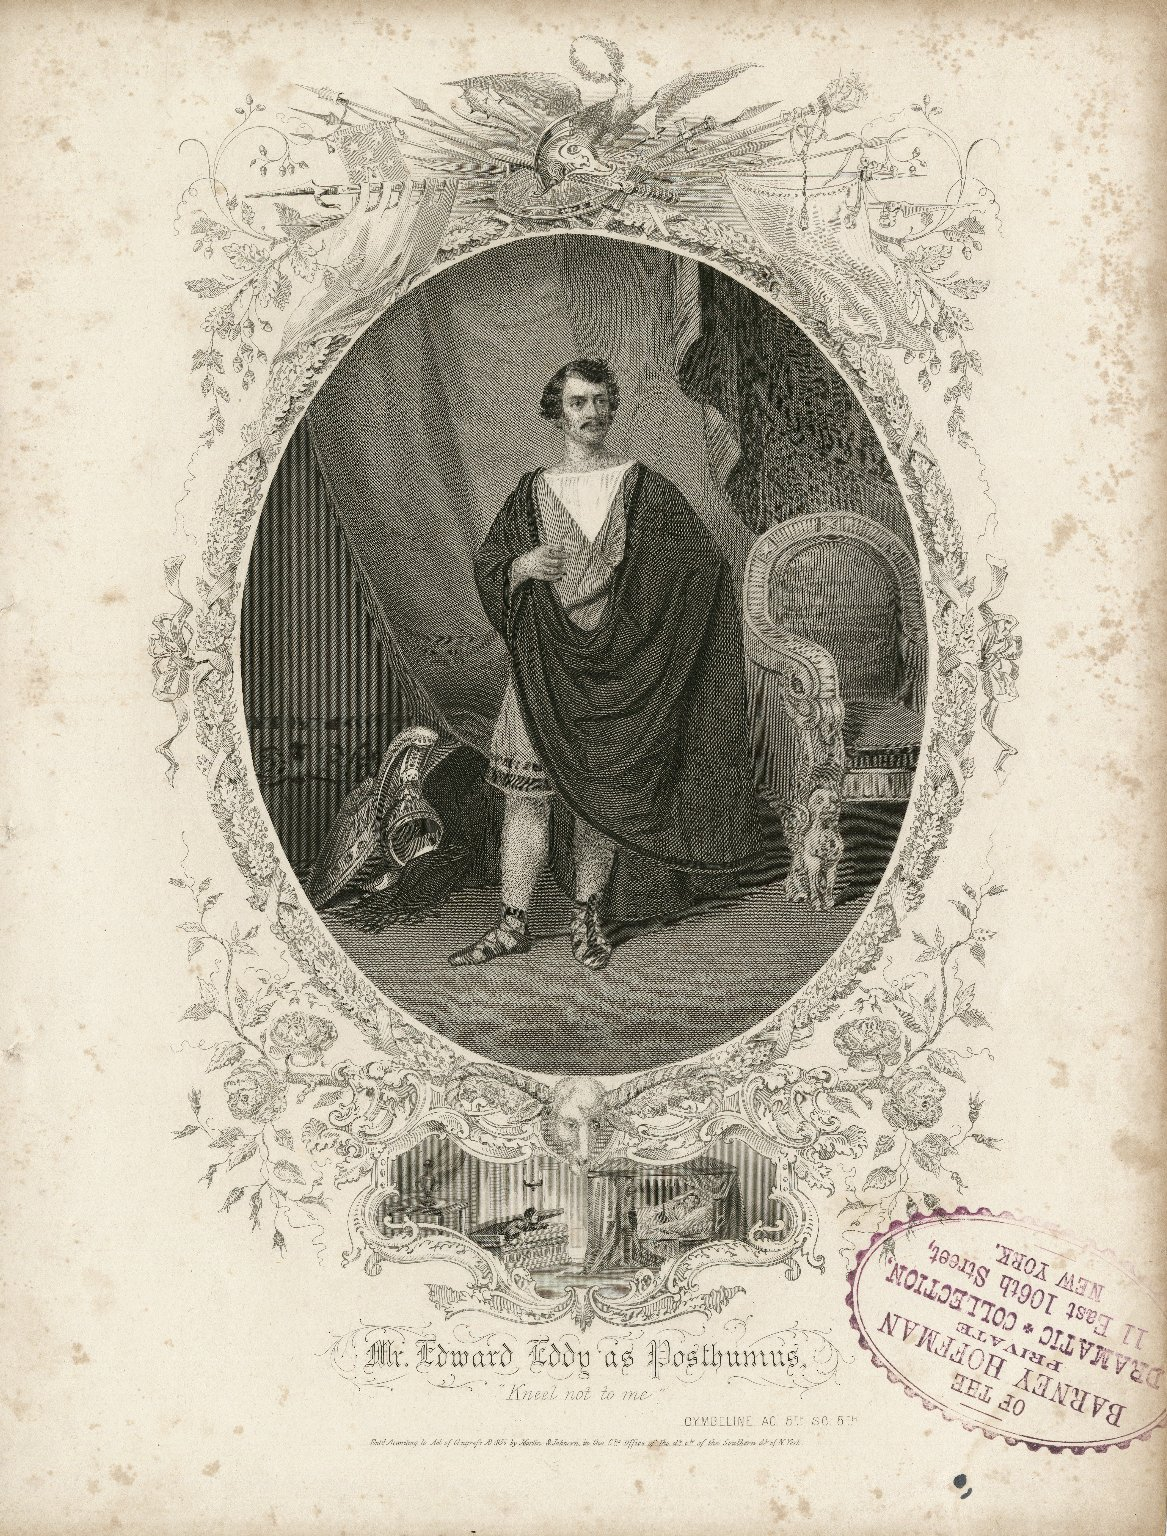 Mr. Edward Eddy as Posthumus [in Shakespeare's Cymbeline] [graphic].